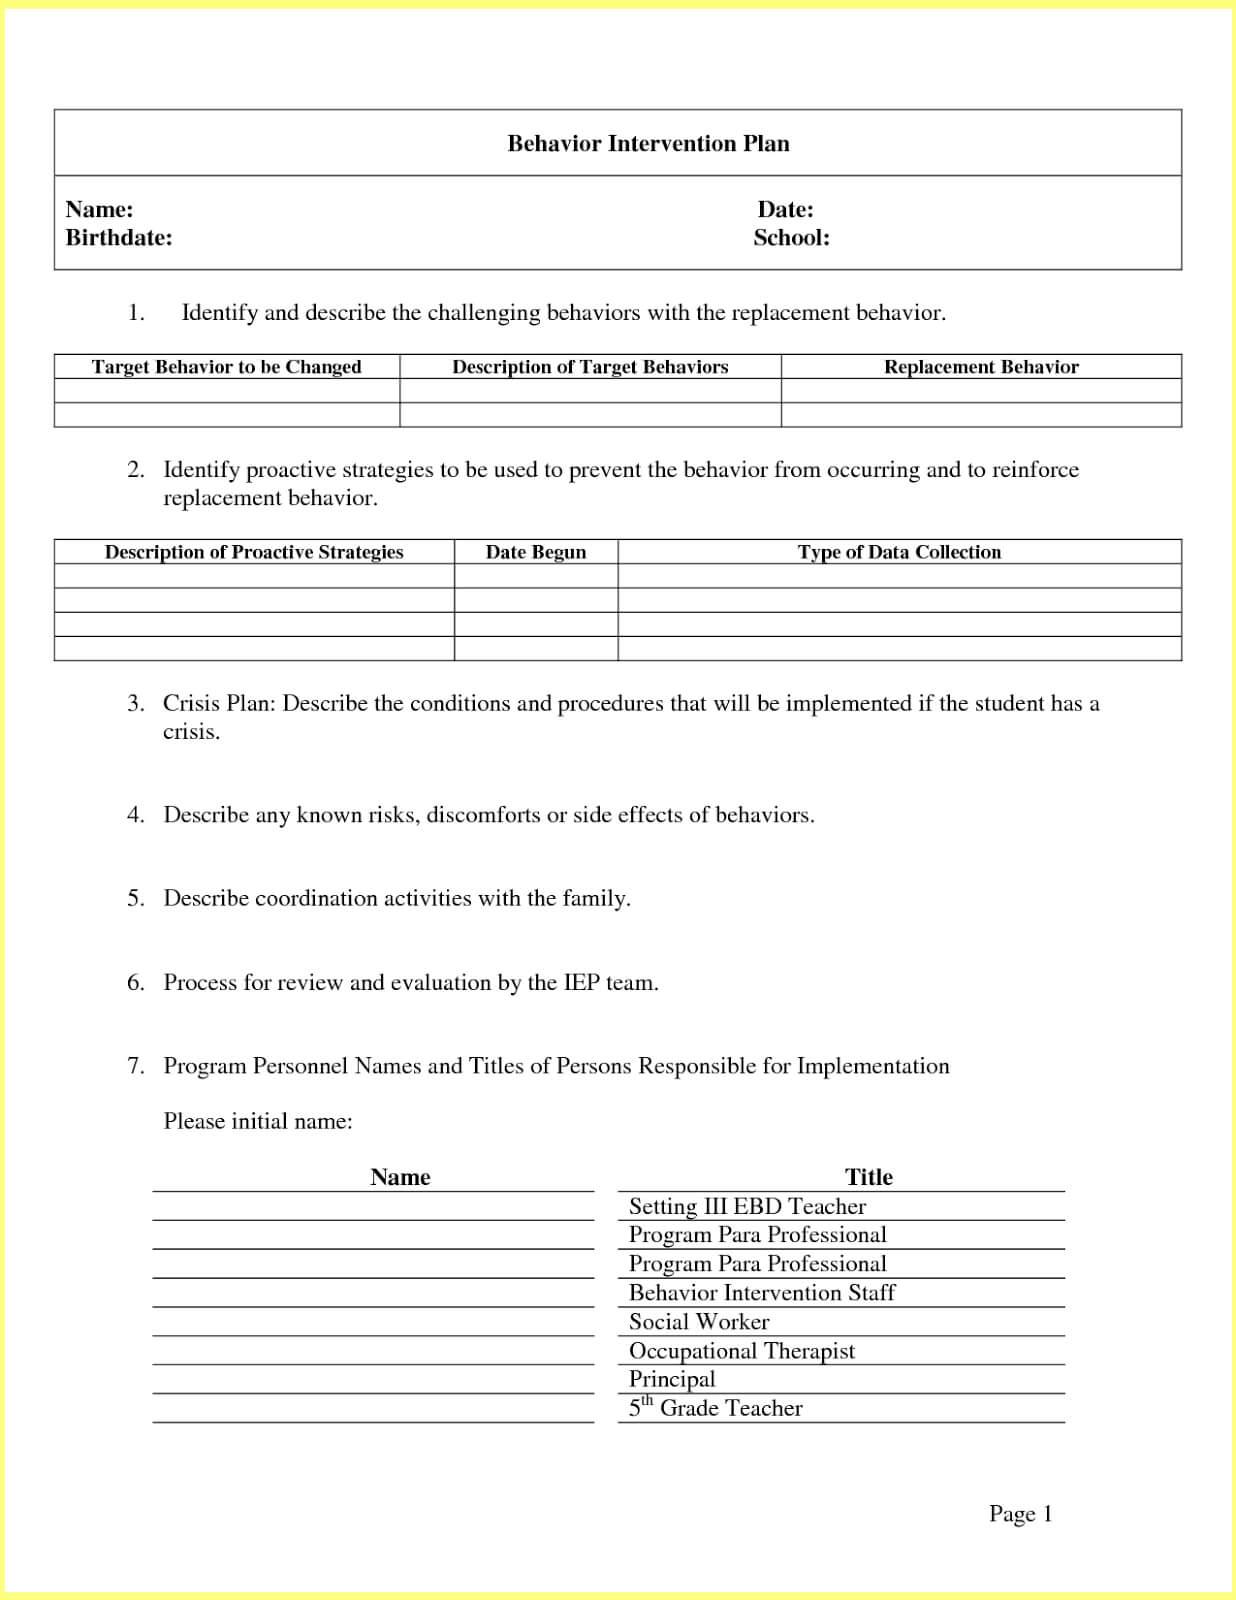 Intervention Report Template ] - Behavior Intervention Plan Within Intervention Report Template